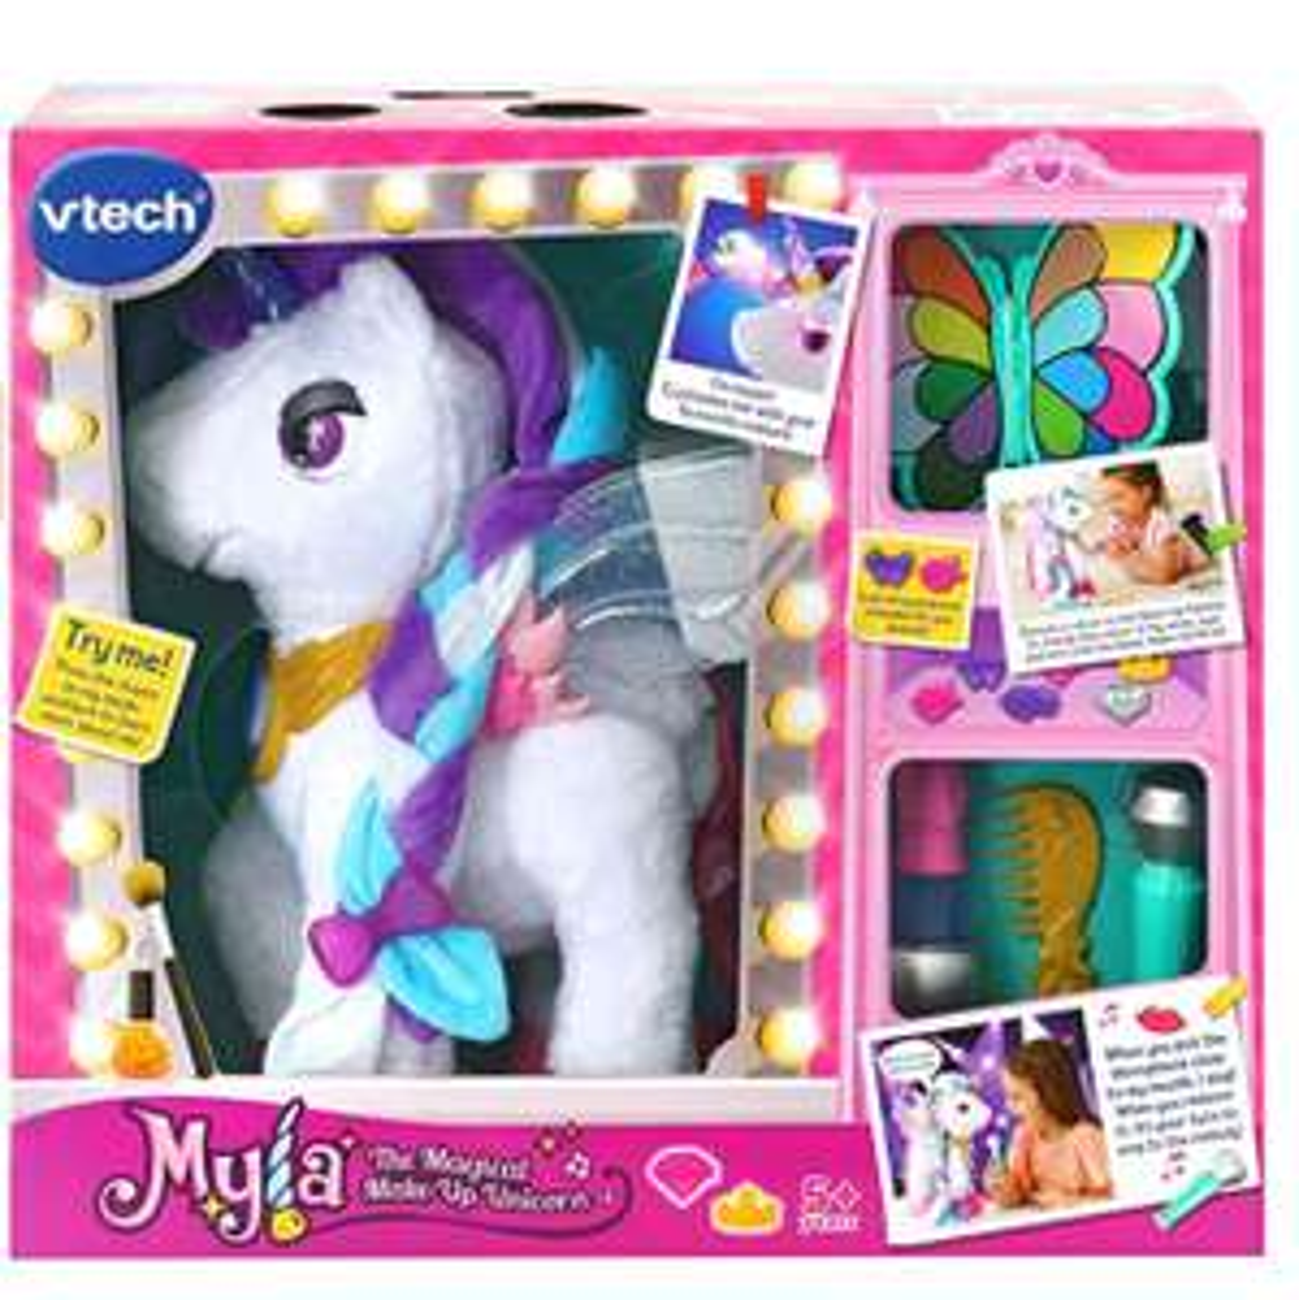 VTech Myla The Magical Make-Up Unicorn  £30.49 @ Amazon